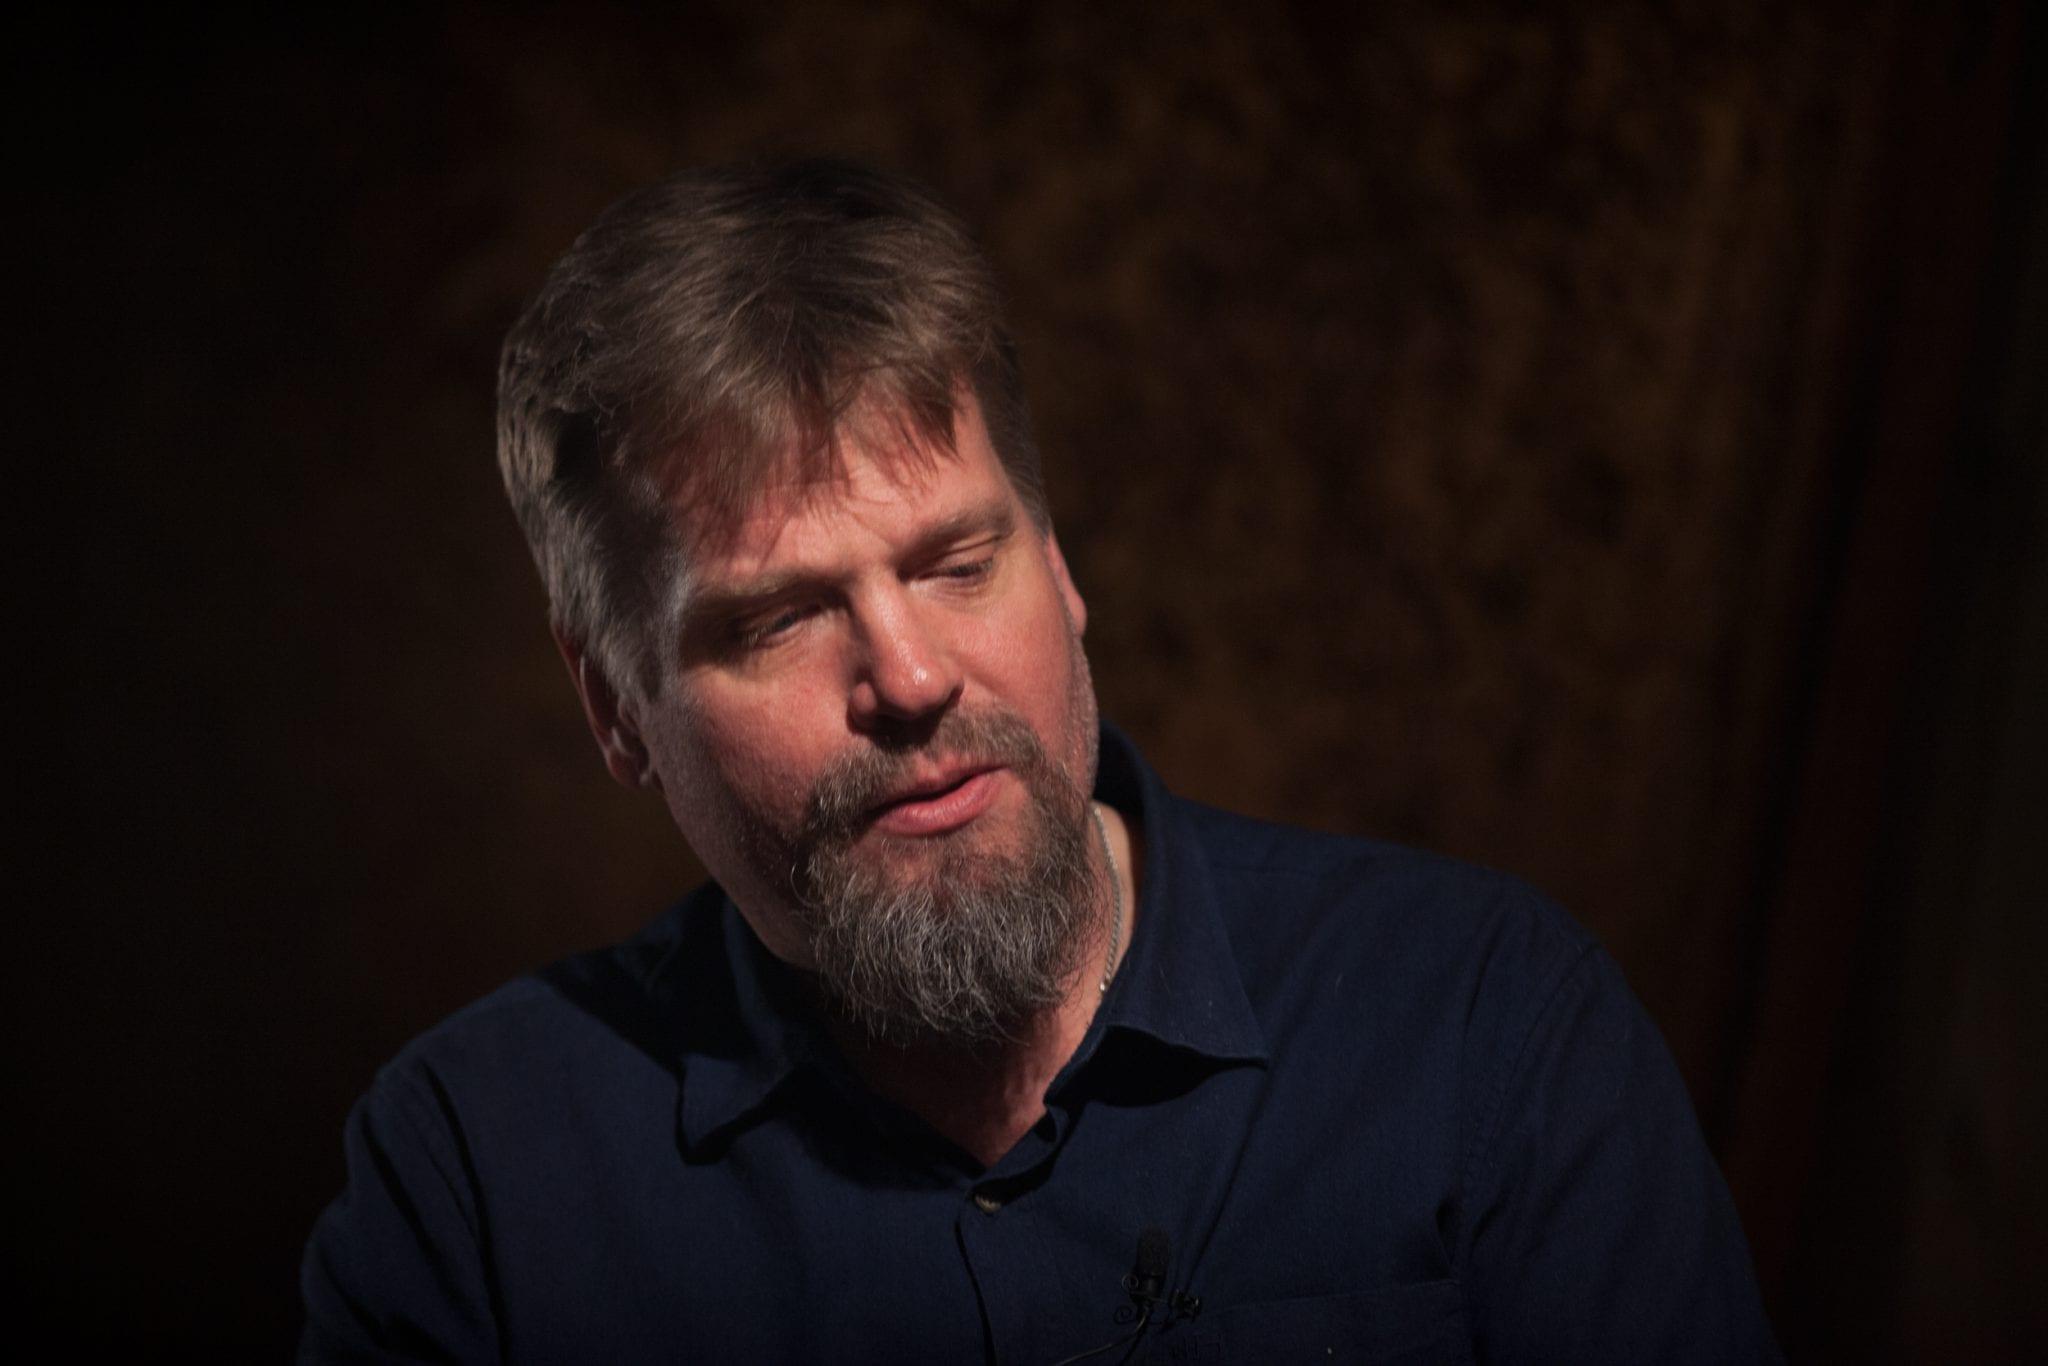 Markus Andersson character assassination in Sweden - Cave of Apelles, Nerdrum School, HErland Report